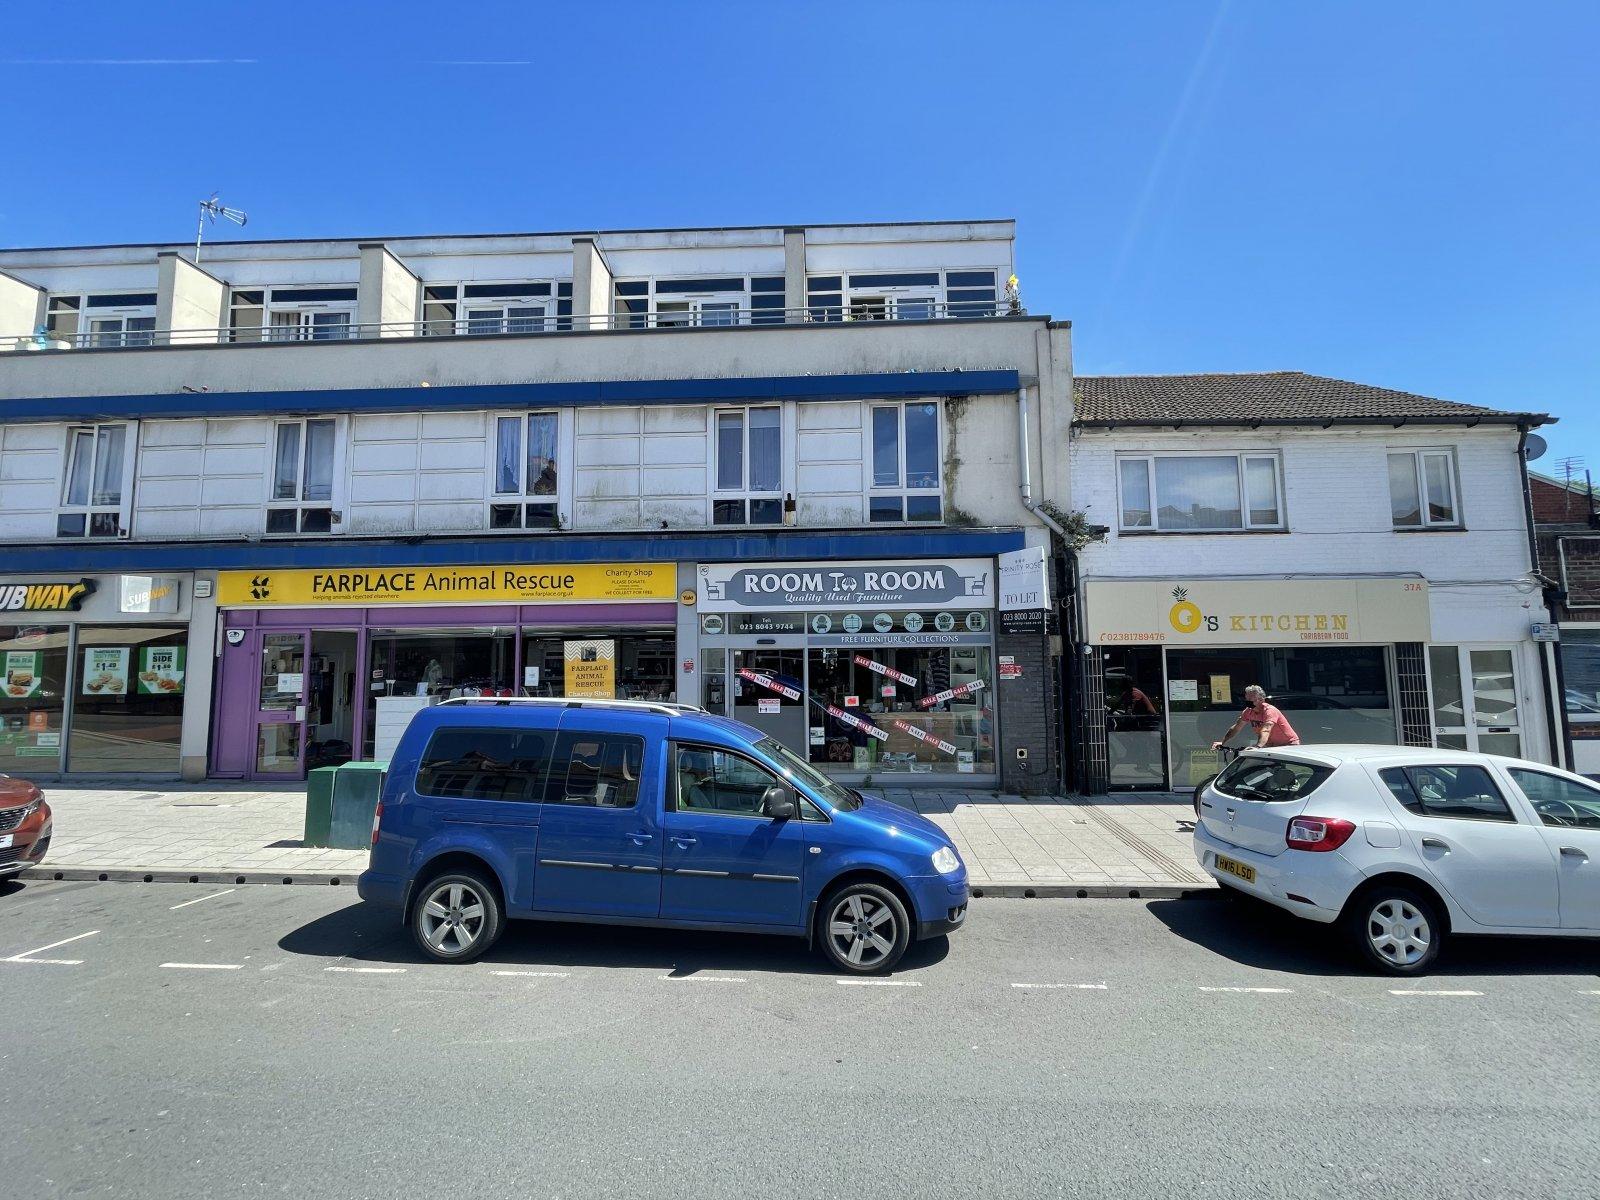 Victoria Road, Southampton